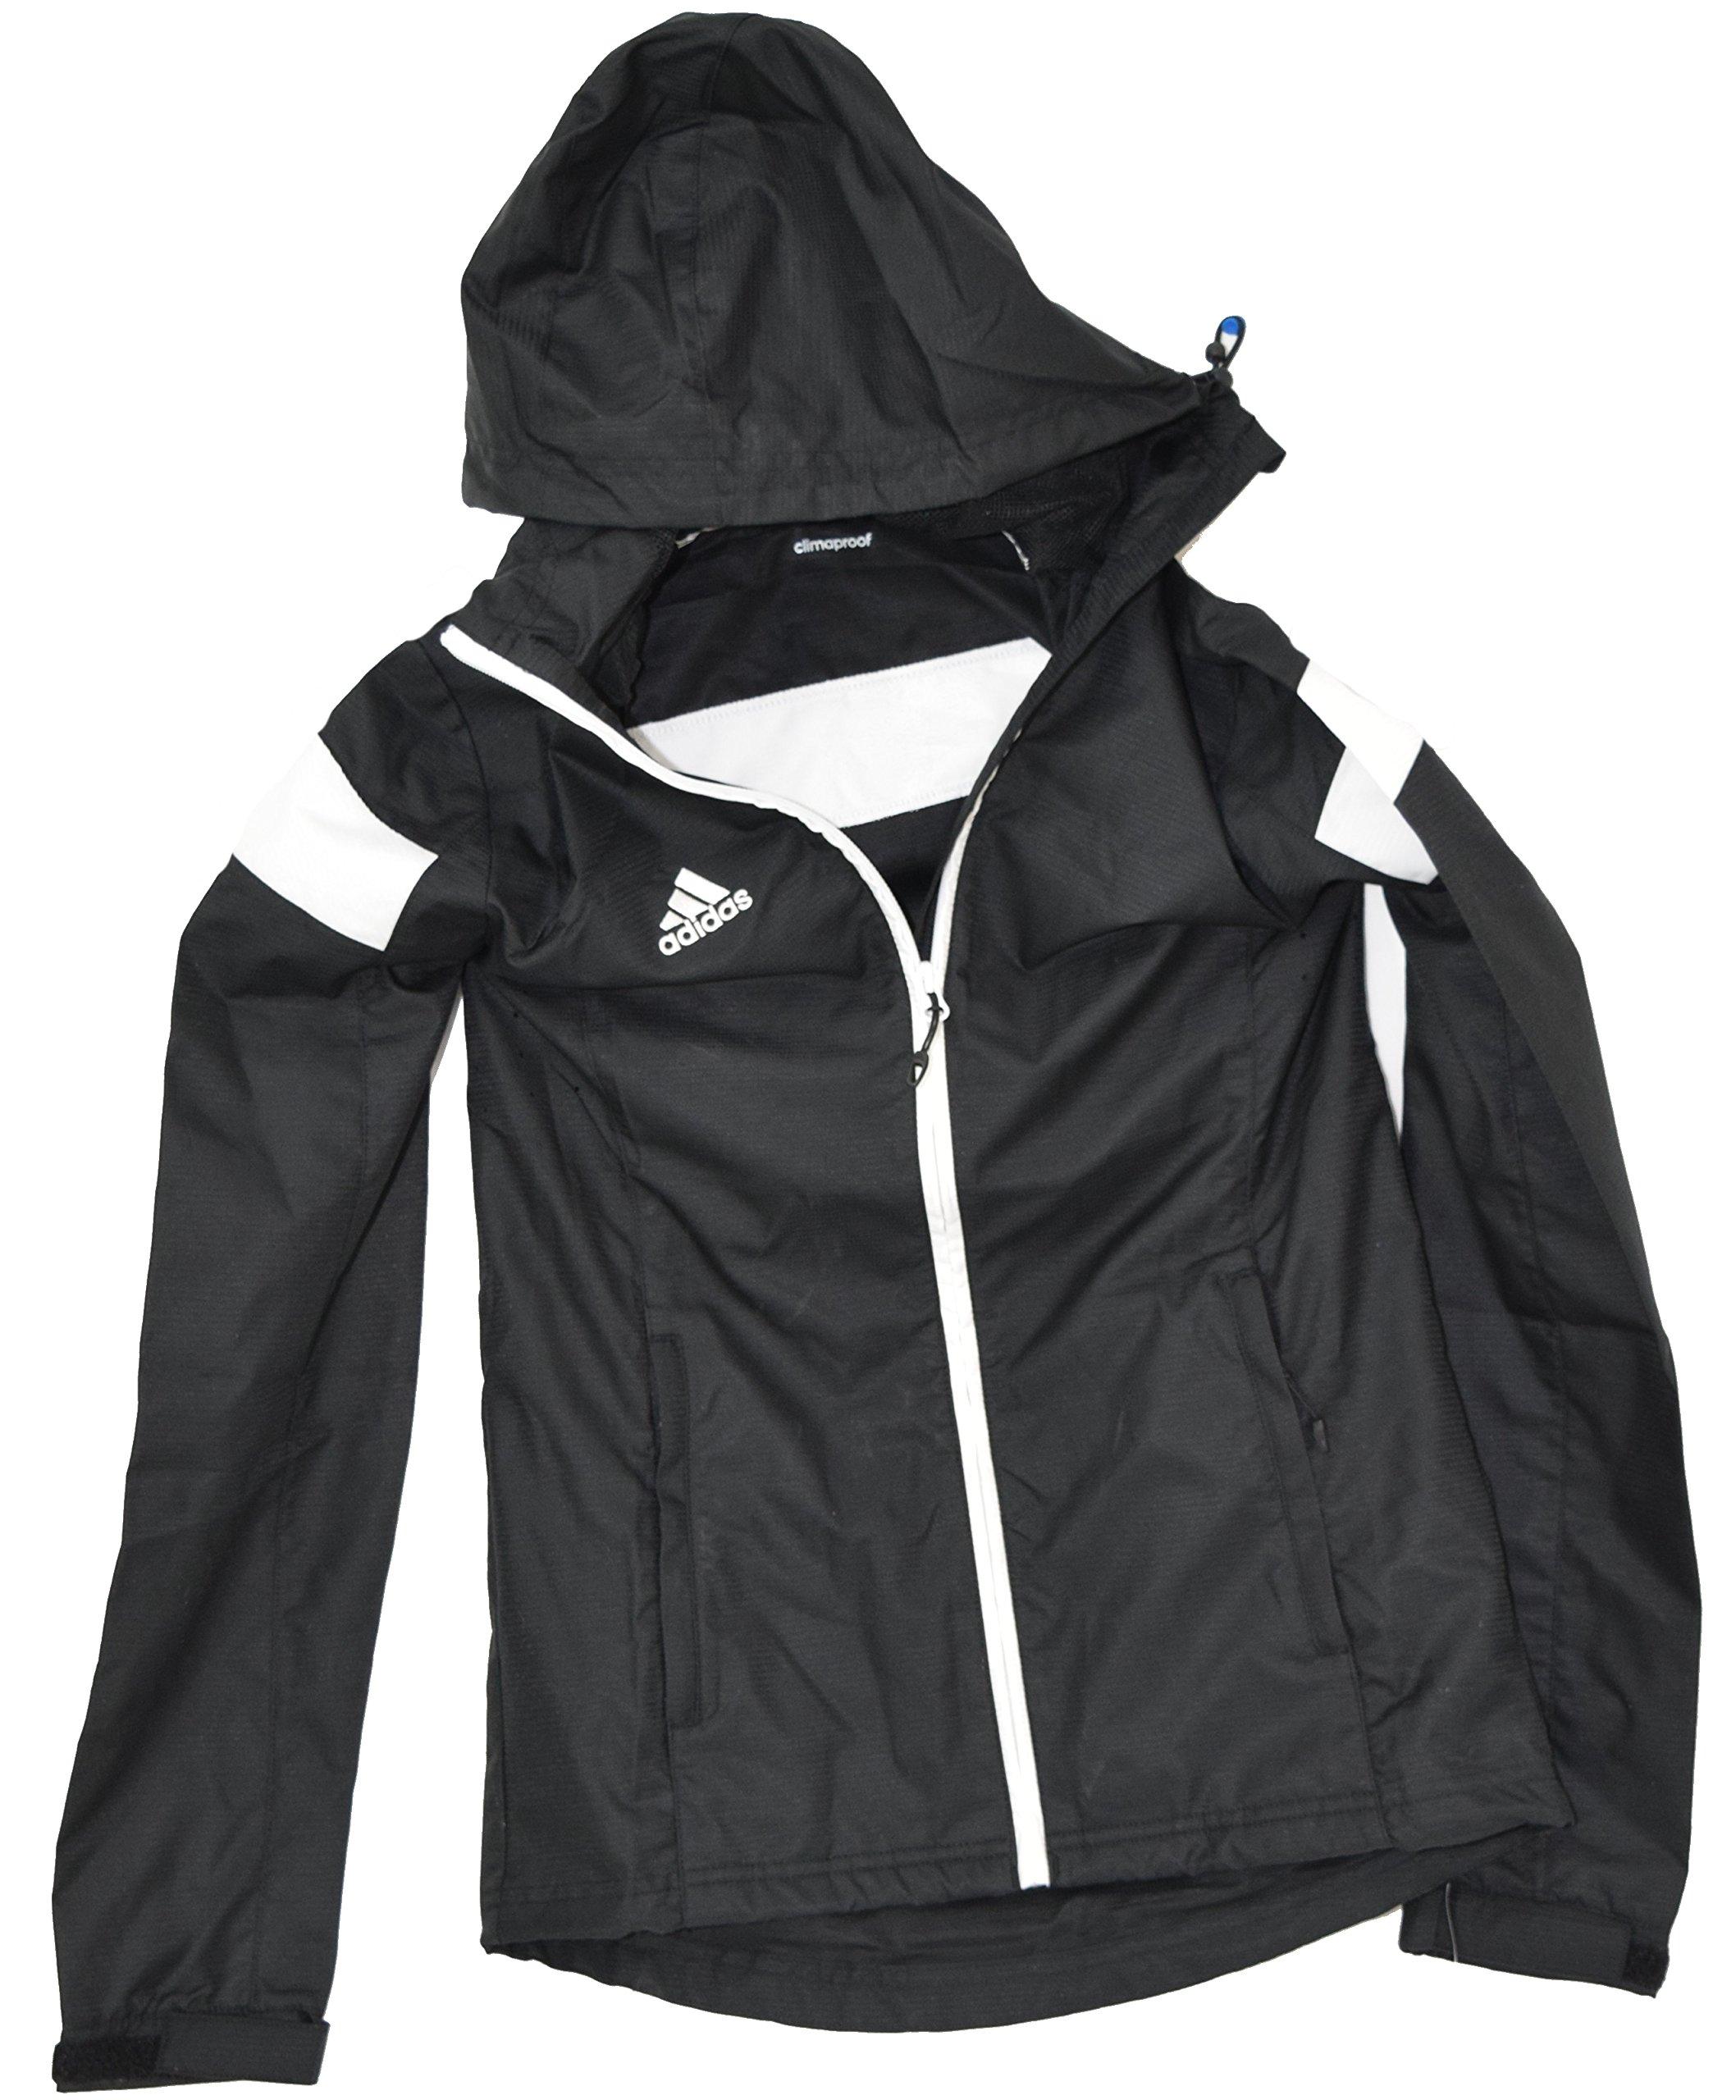 adidas Womens Team Woven Jacket, Black/White, X-Small